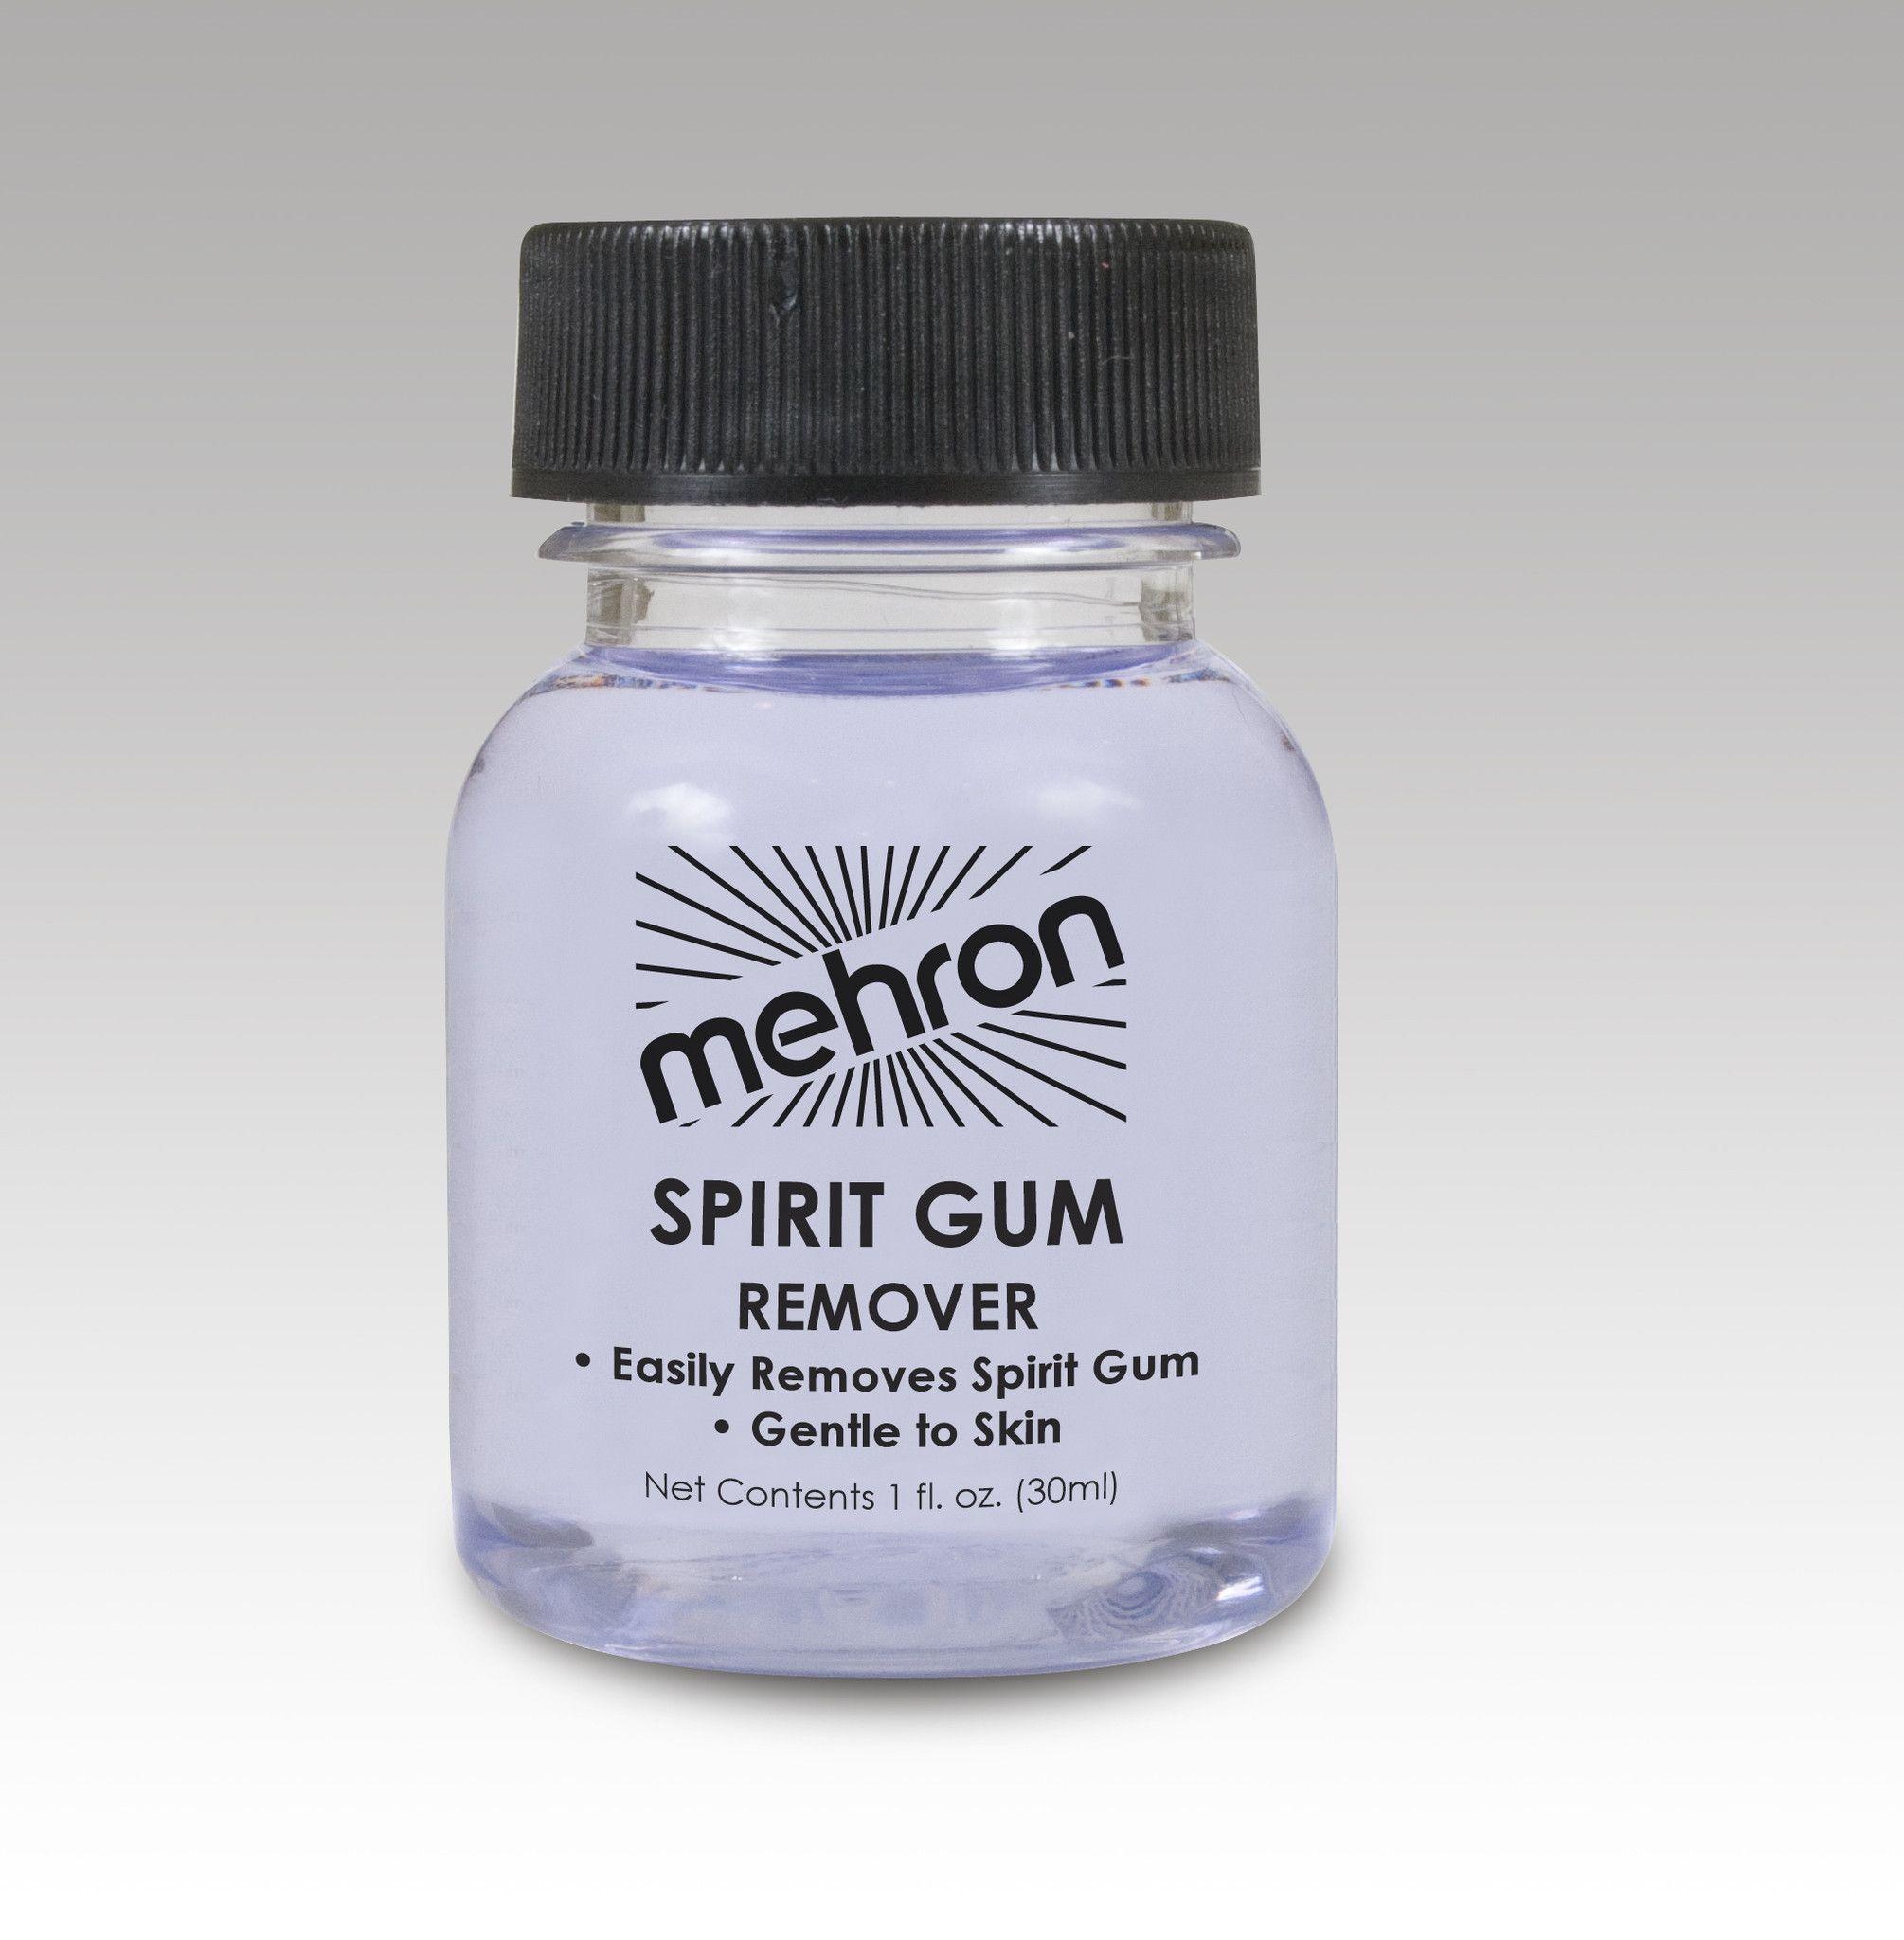 Mehron Spirit Gum Remover Gum removal, Makeup remover